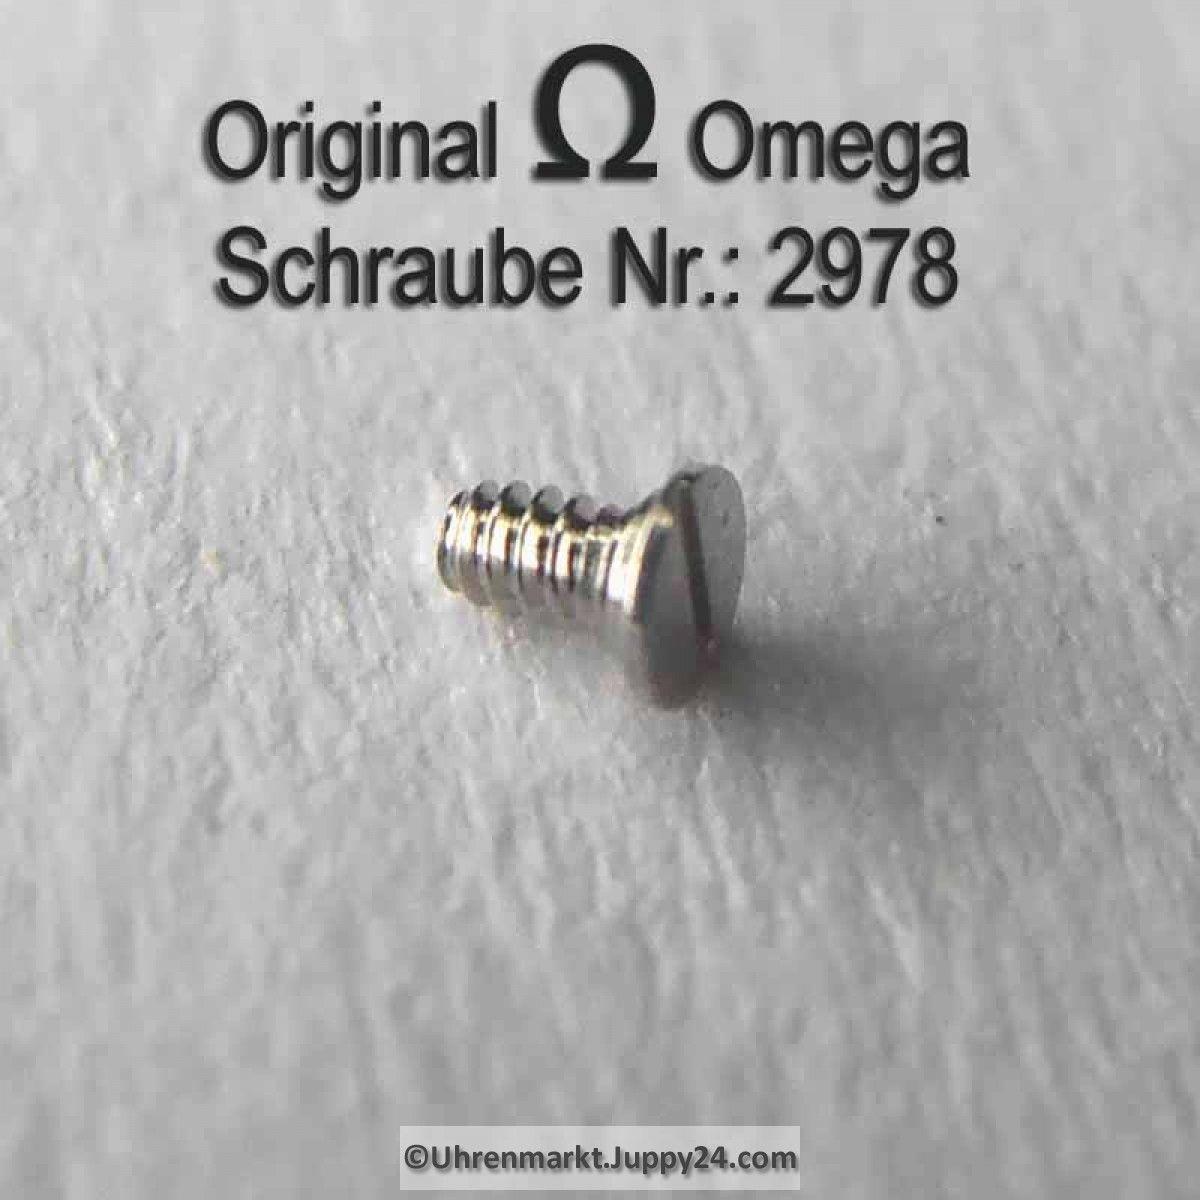 Omega Schraube 2978 Part Nr. Omega 2978 - Omega Ersatzteile -